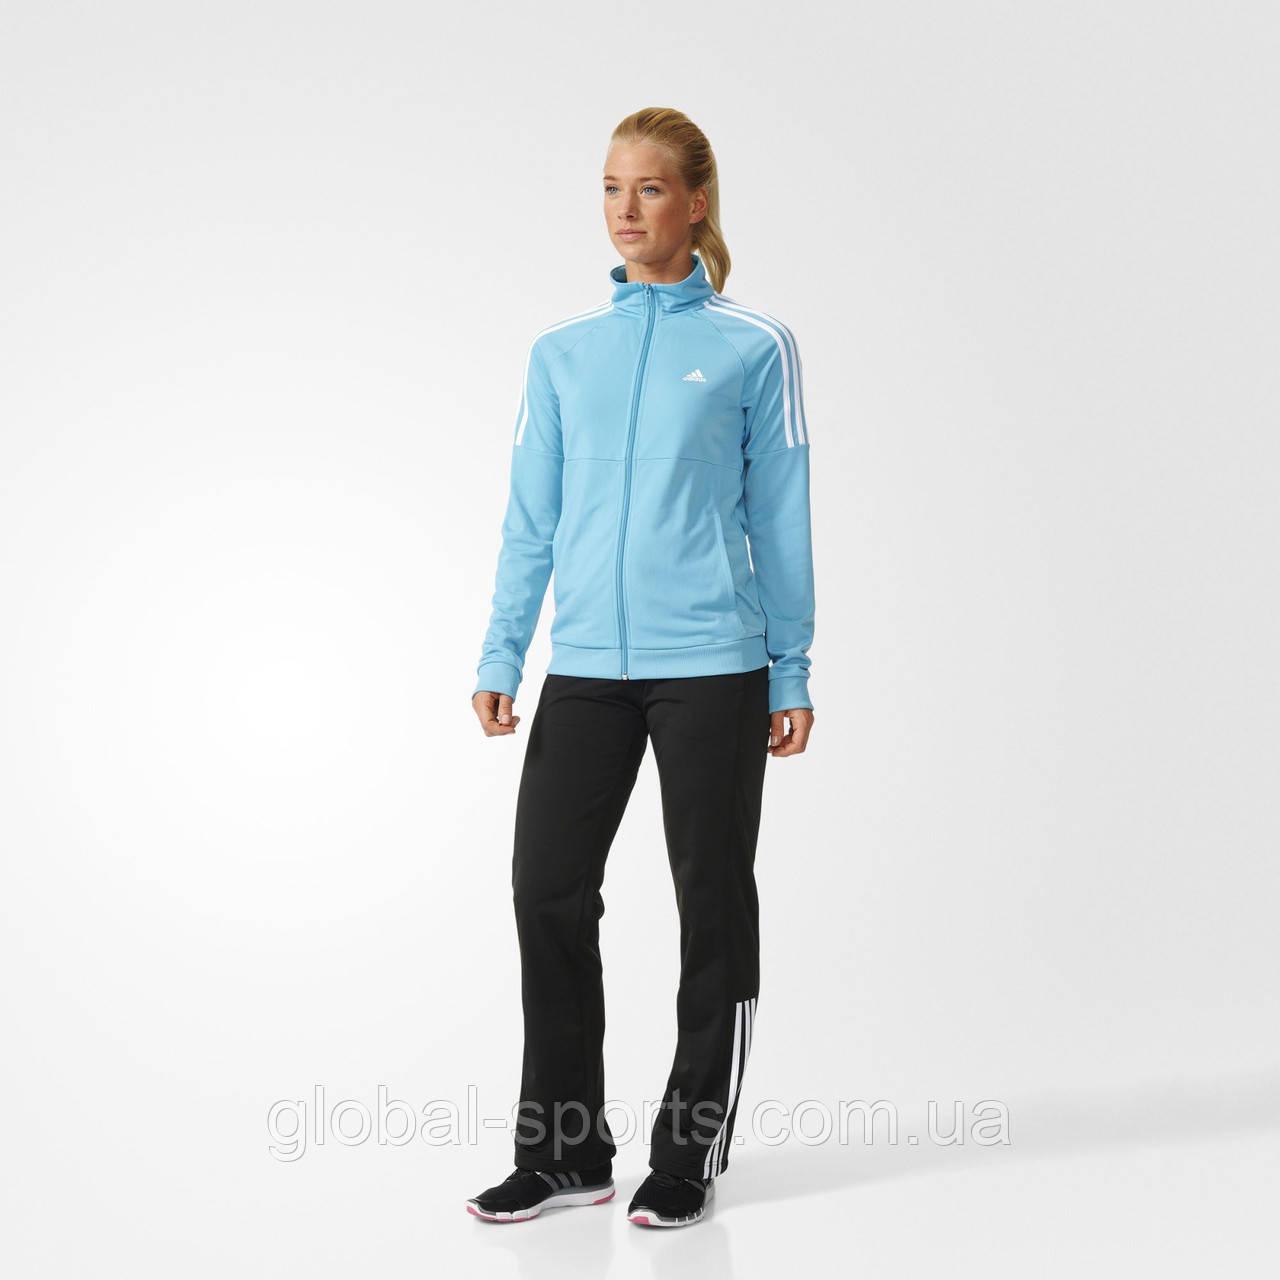 a04d477b16e Женский спортивный костюм Adidas FRIEDA SUIT (Артикул  AY1804) - магазин  Global Sport в